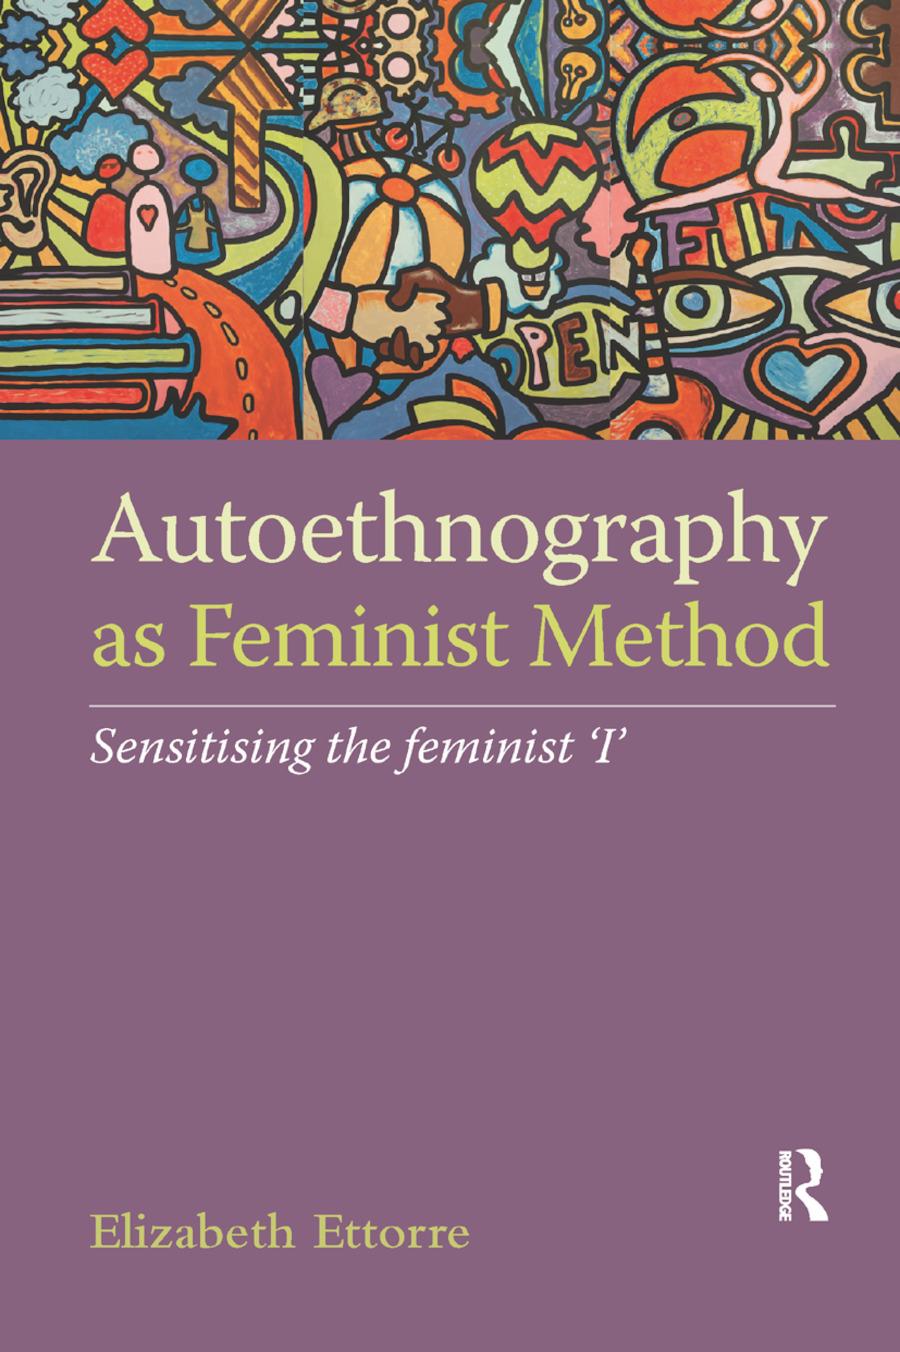 Autoethnography as Feminist Method: Sensitising the feminist 'I' book cover